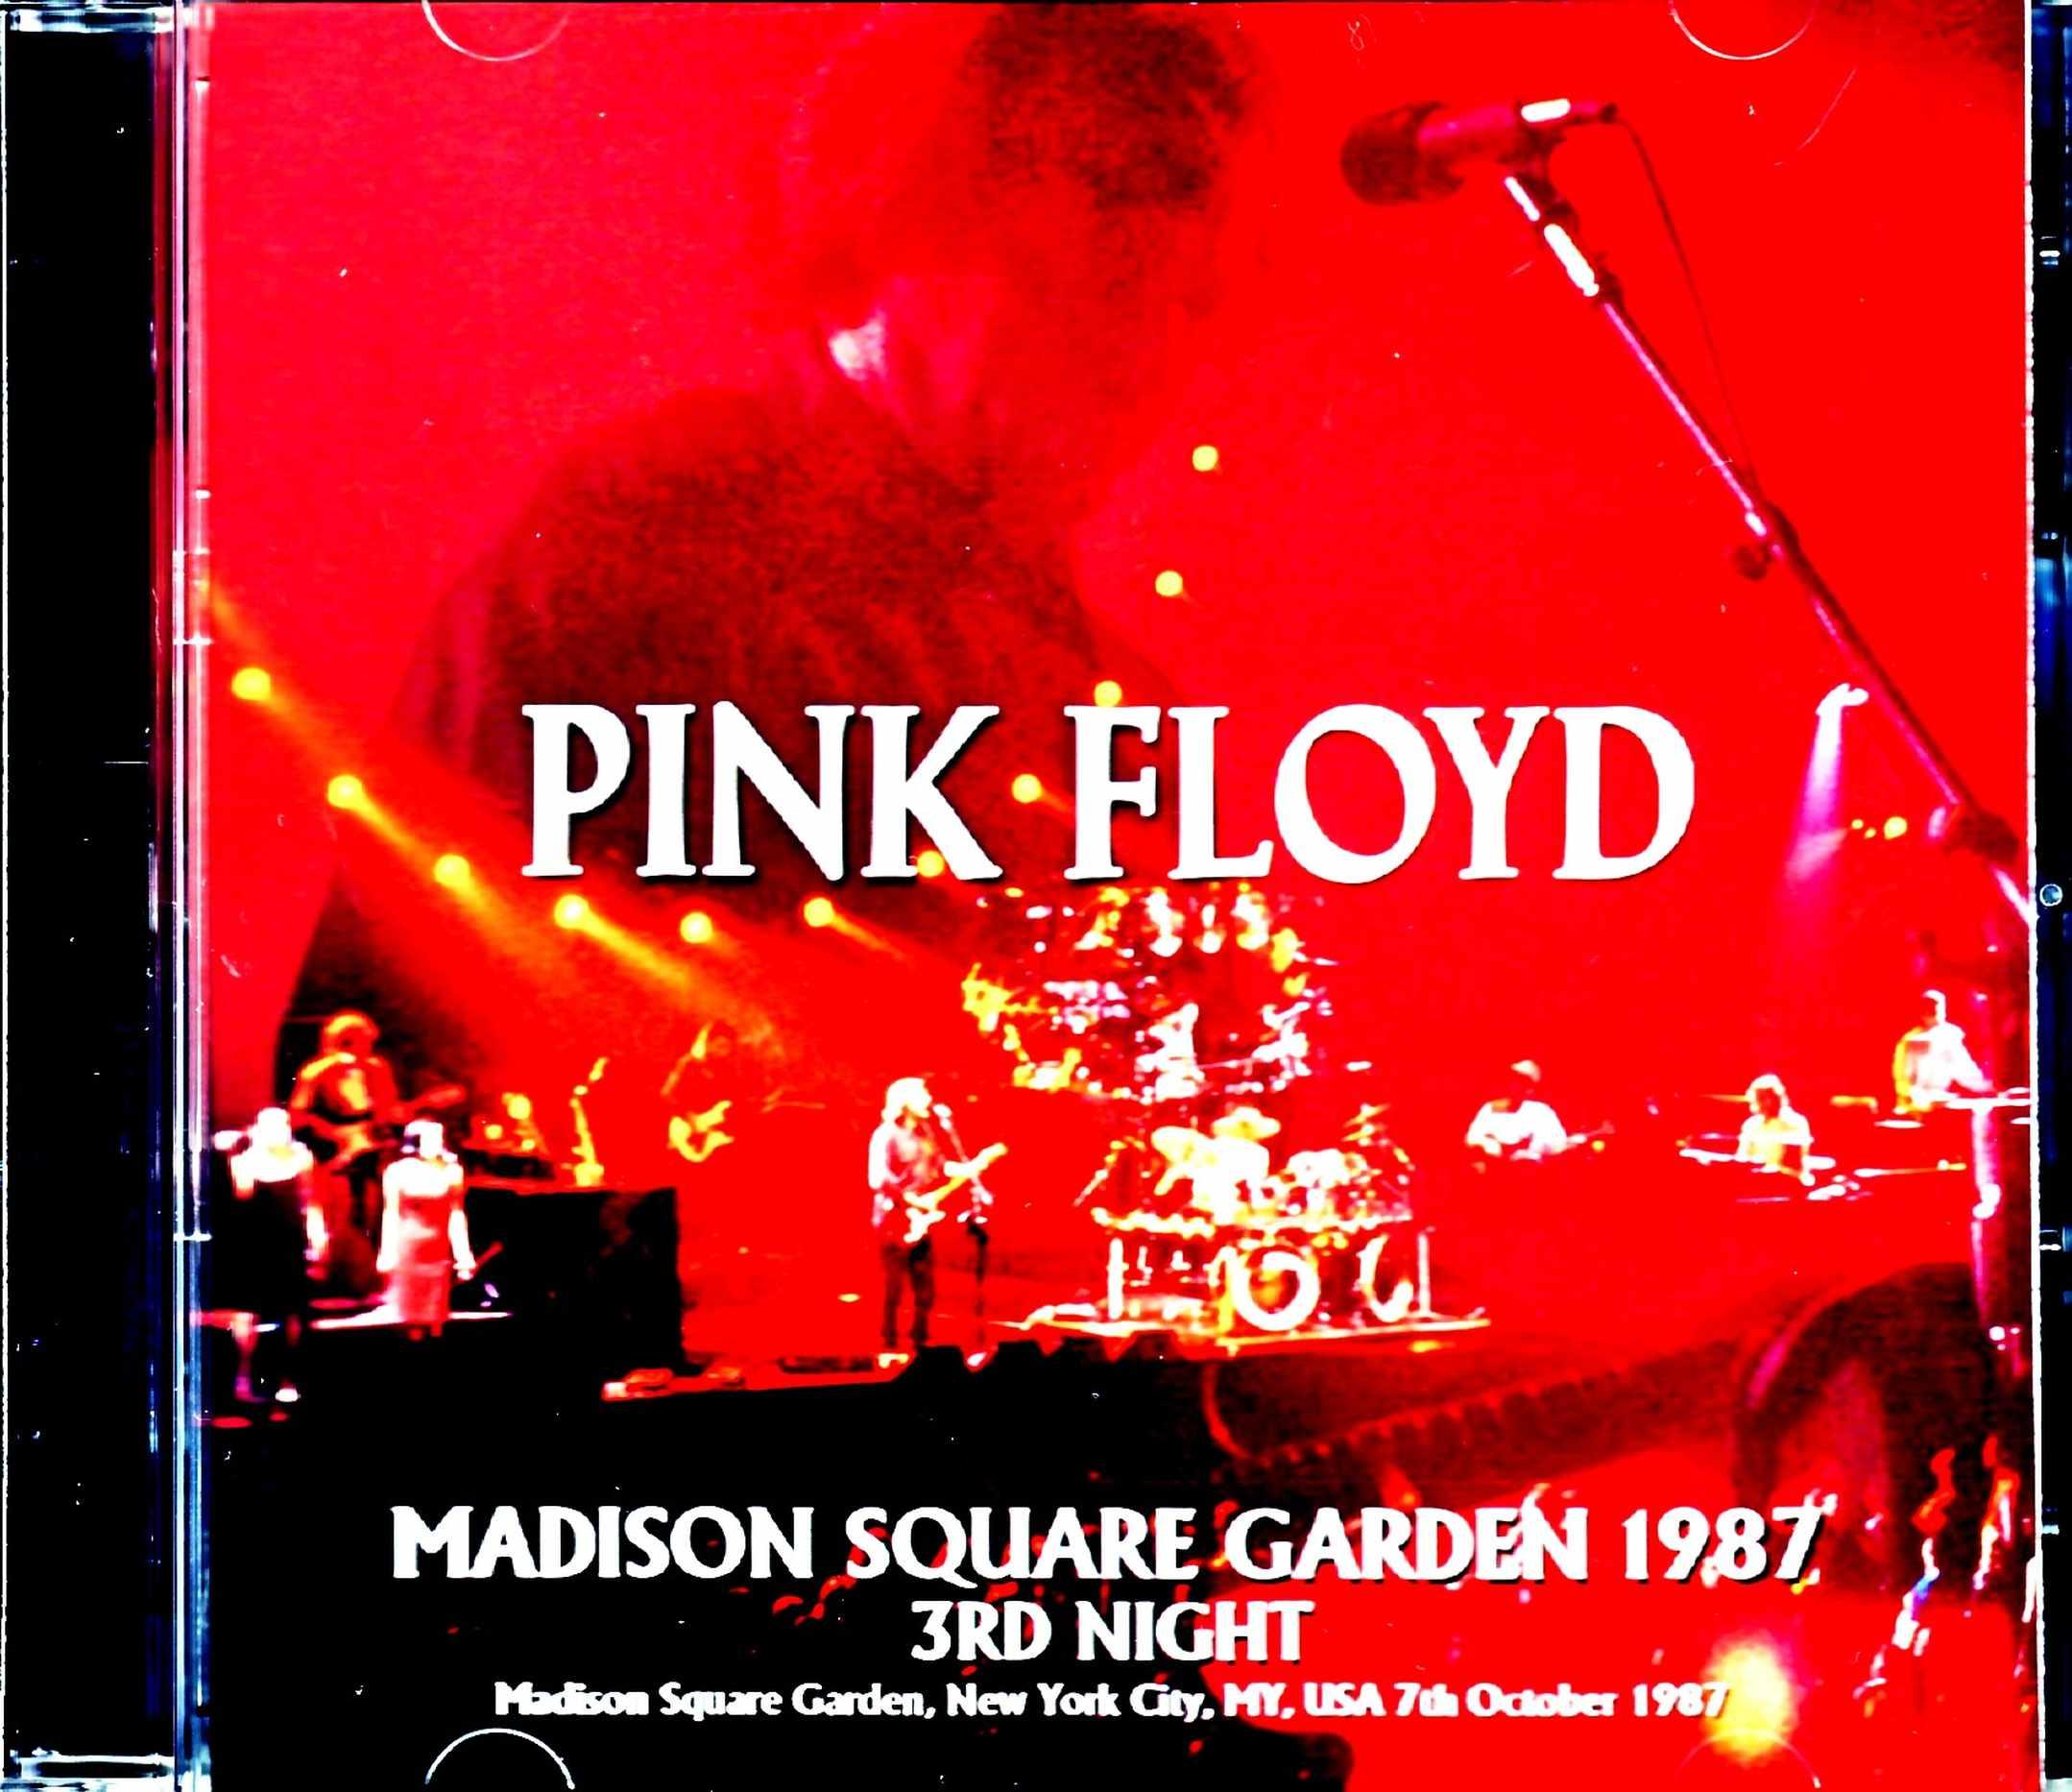 Pink Floyd ピンク・フロイド/NY,USA 10.7.1987